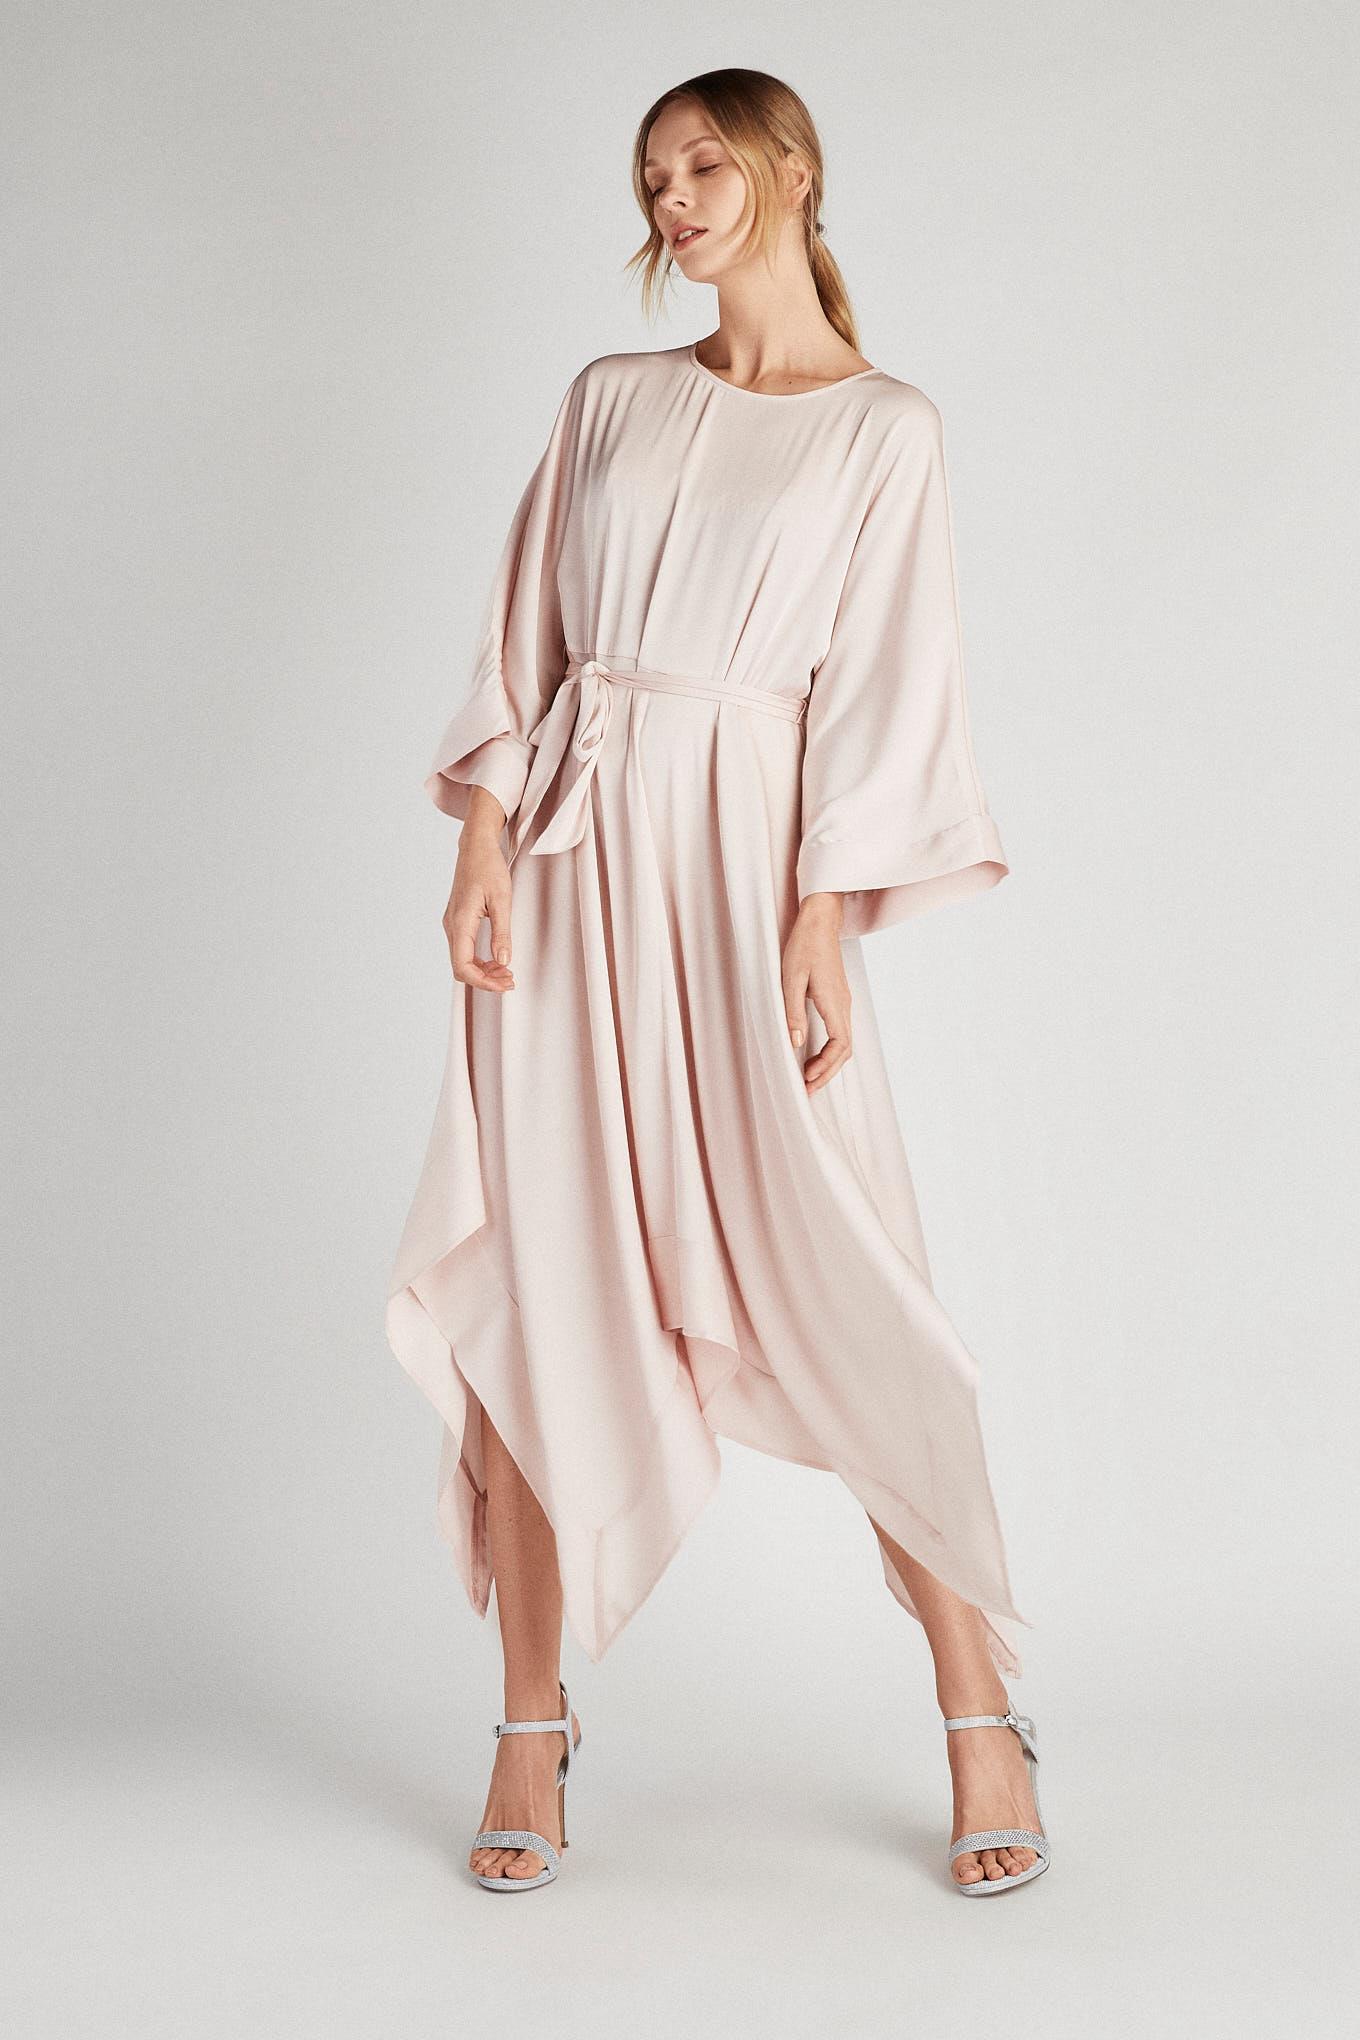 Vestido Rosa Pálido Fantasy Mulher